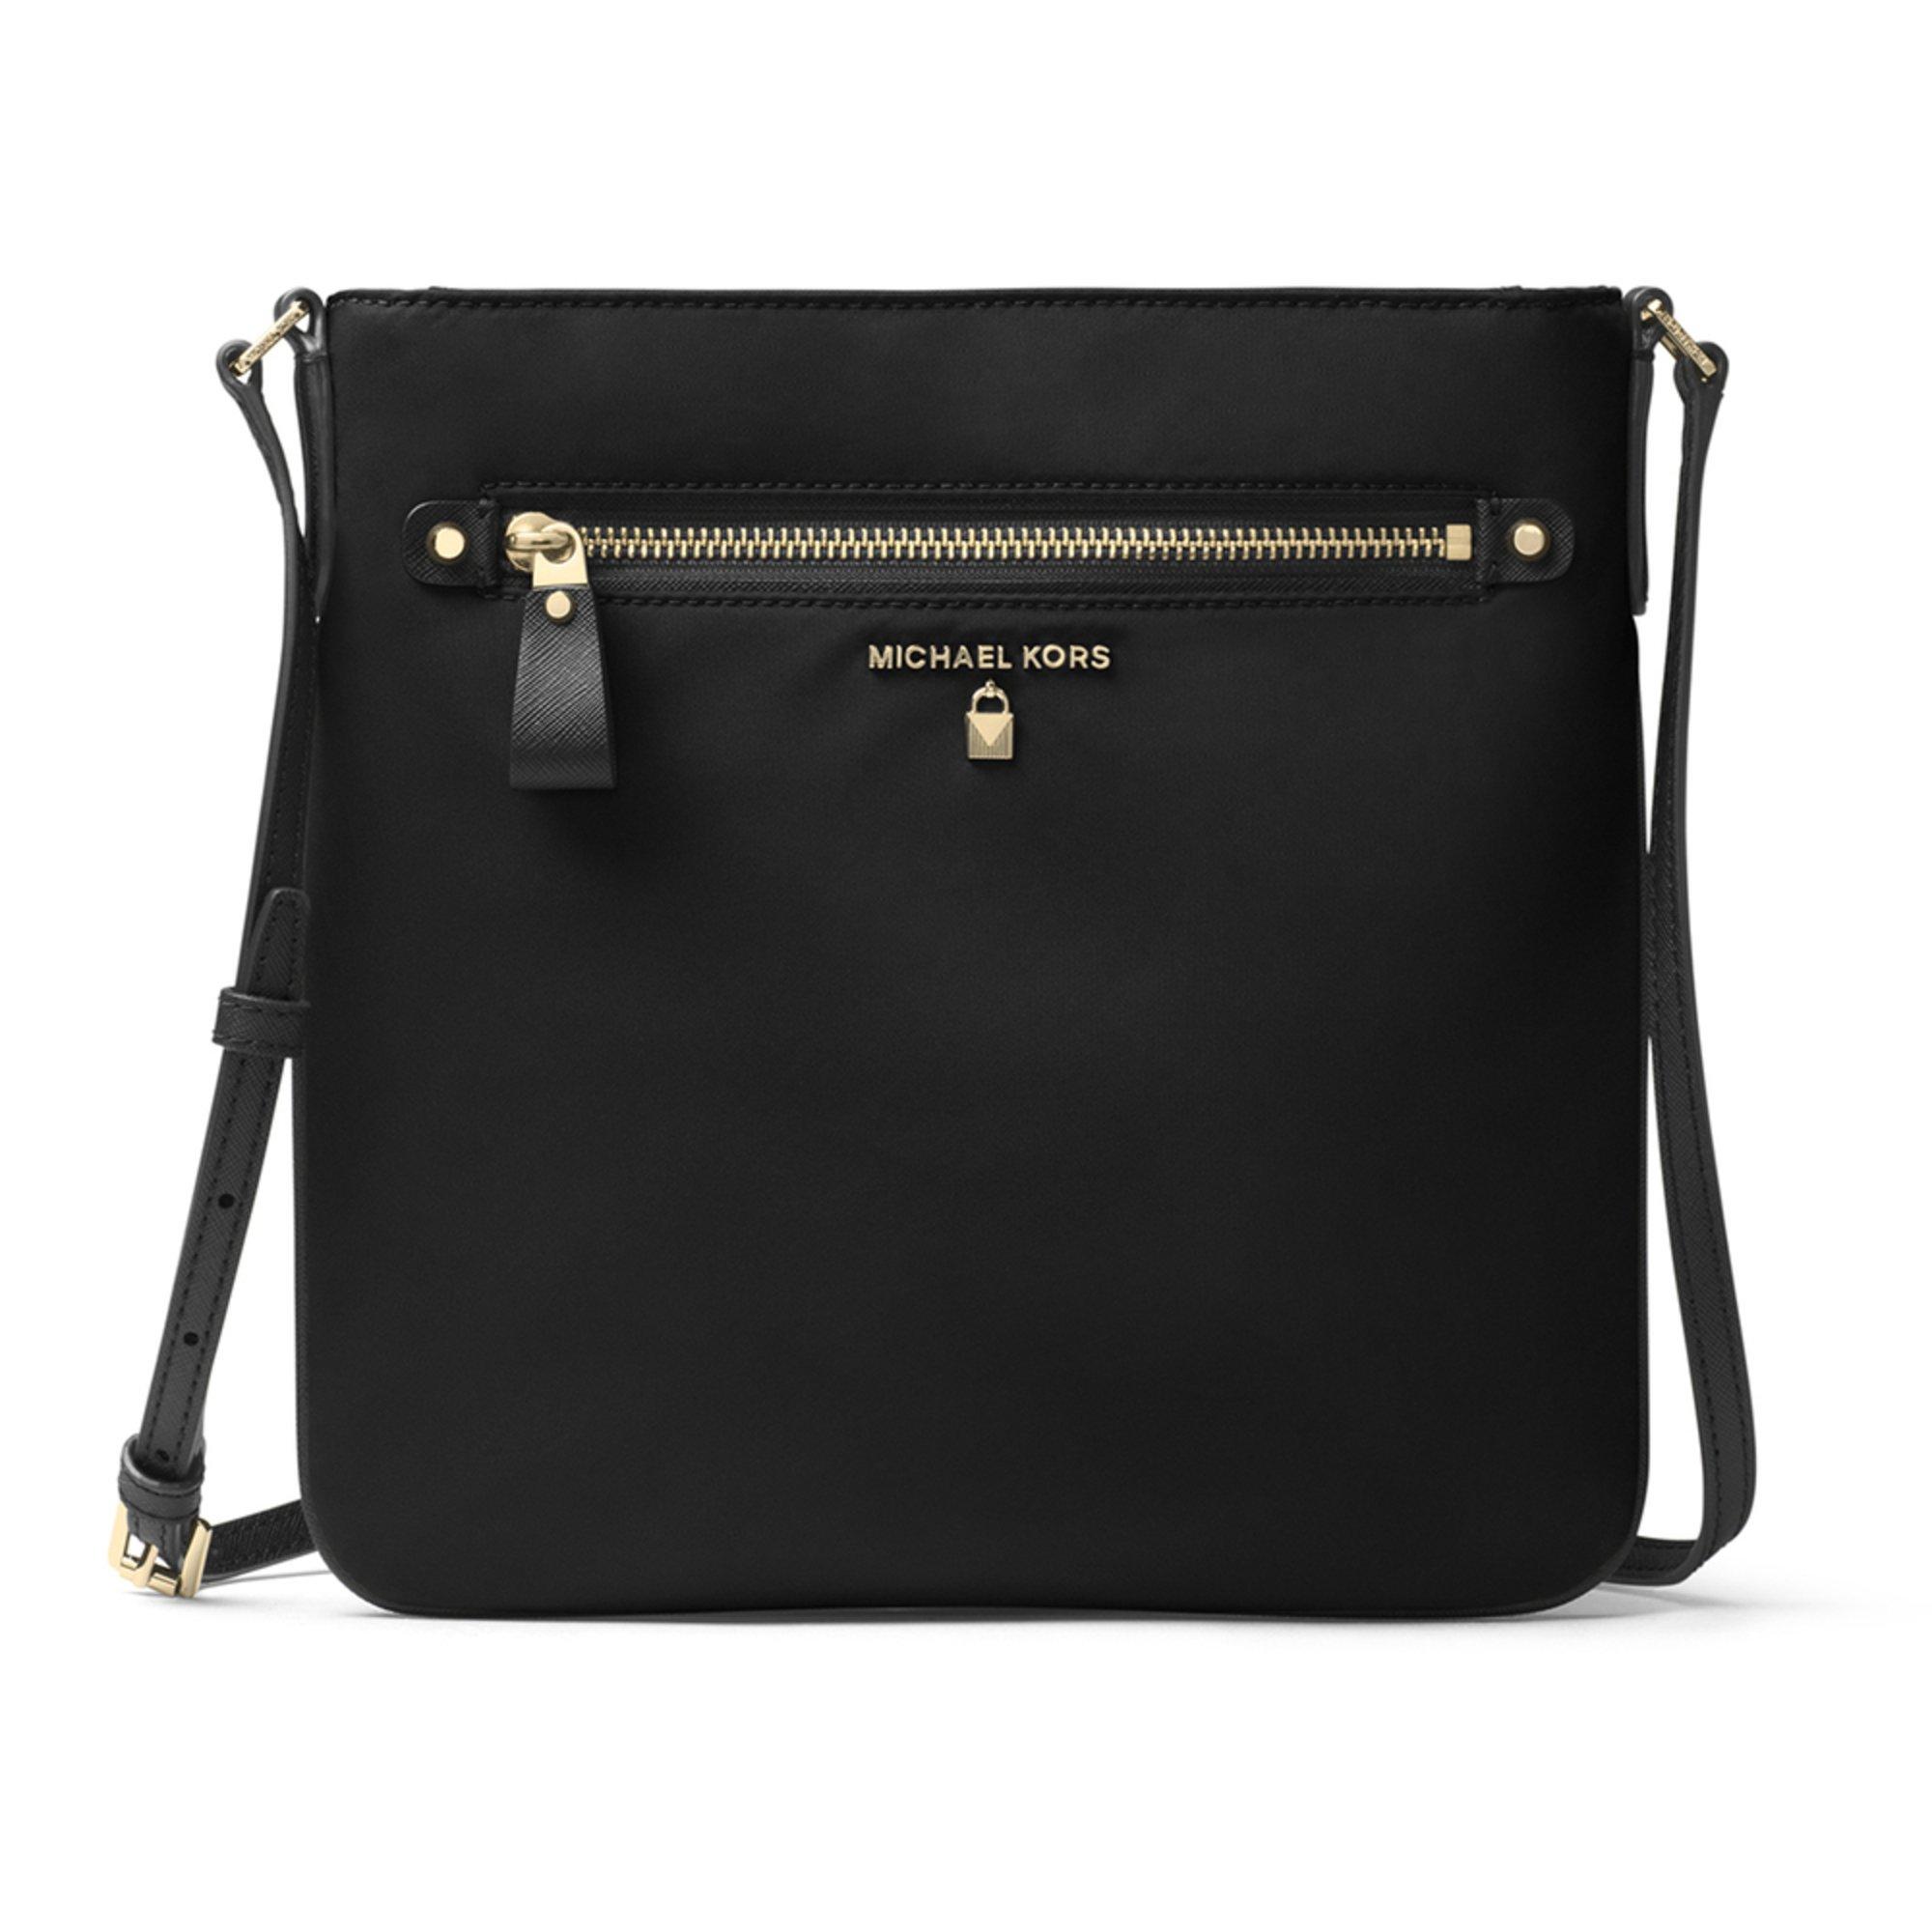 8b55fc49ba30 Michael Kors Nylon Kelsey Large Crossbody Black | Crossbody & Messenger Bags  | Handbags & Sunglasses - Shop Your Navy Exchange - Official Site